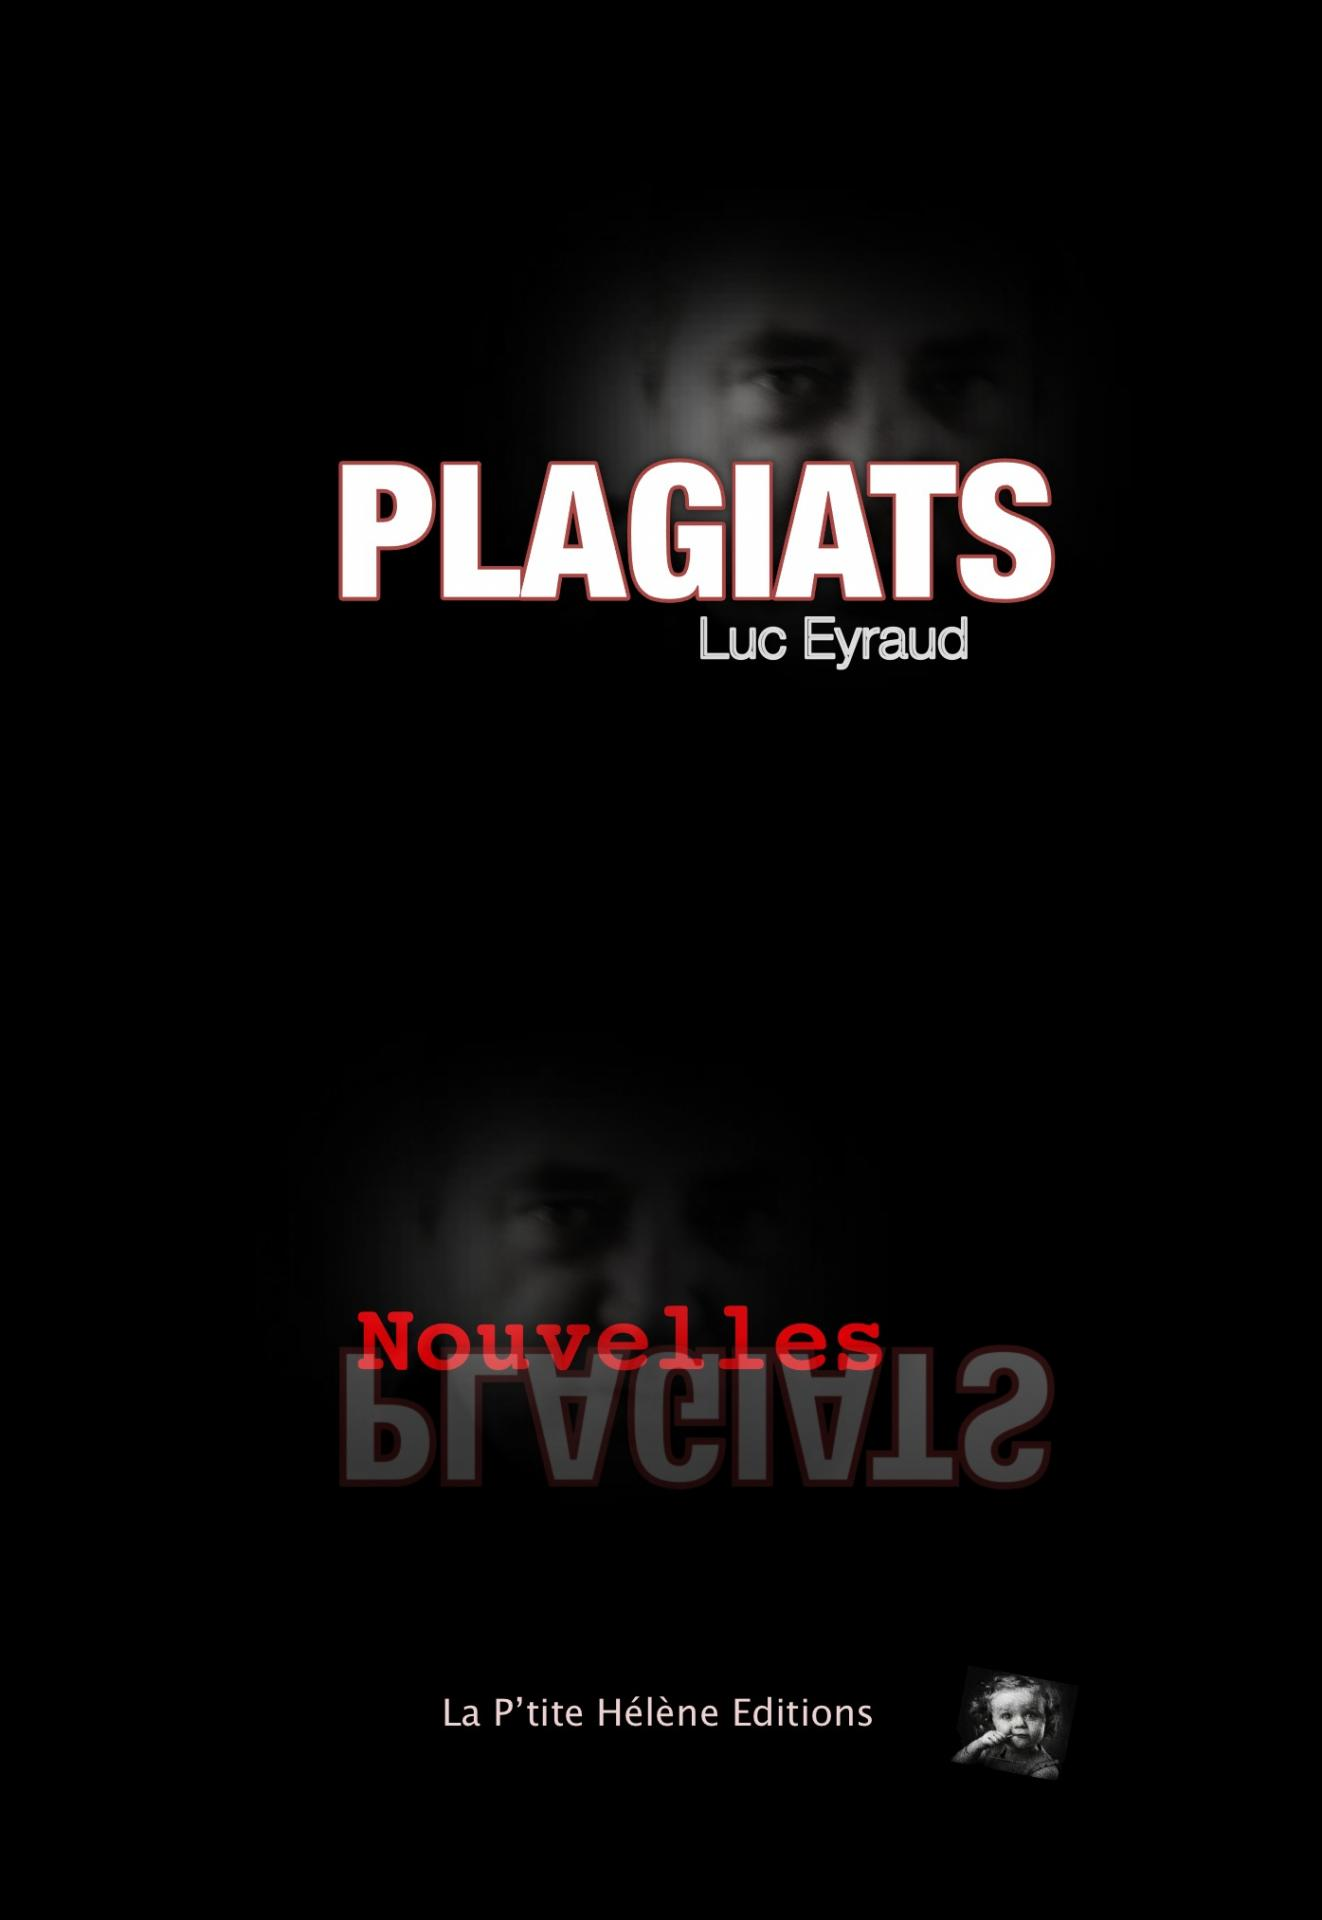 Plag333